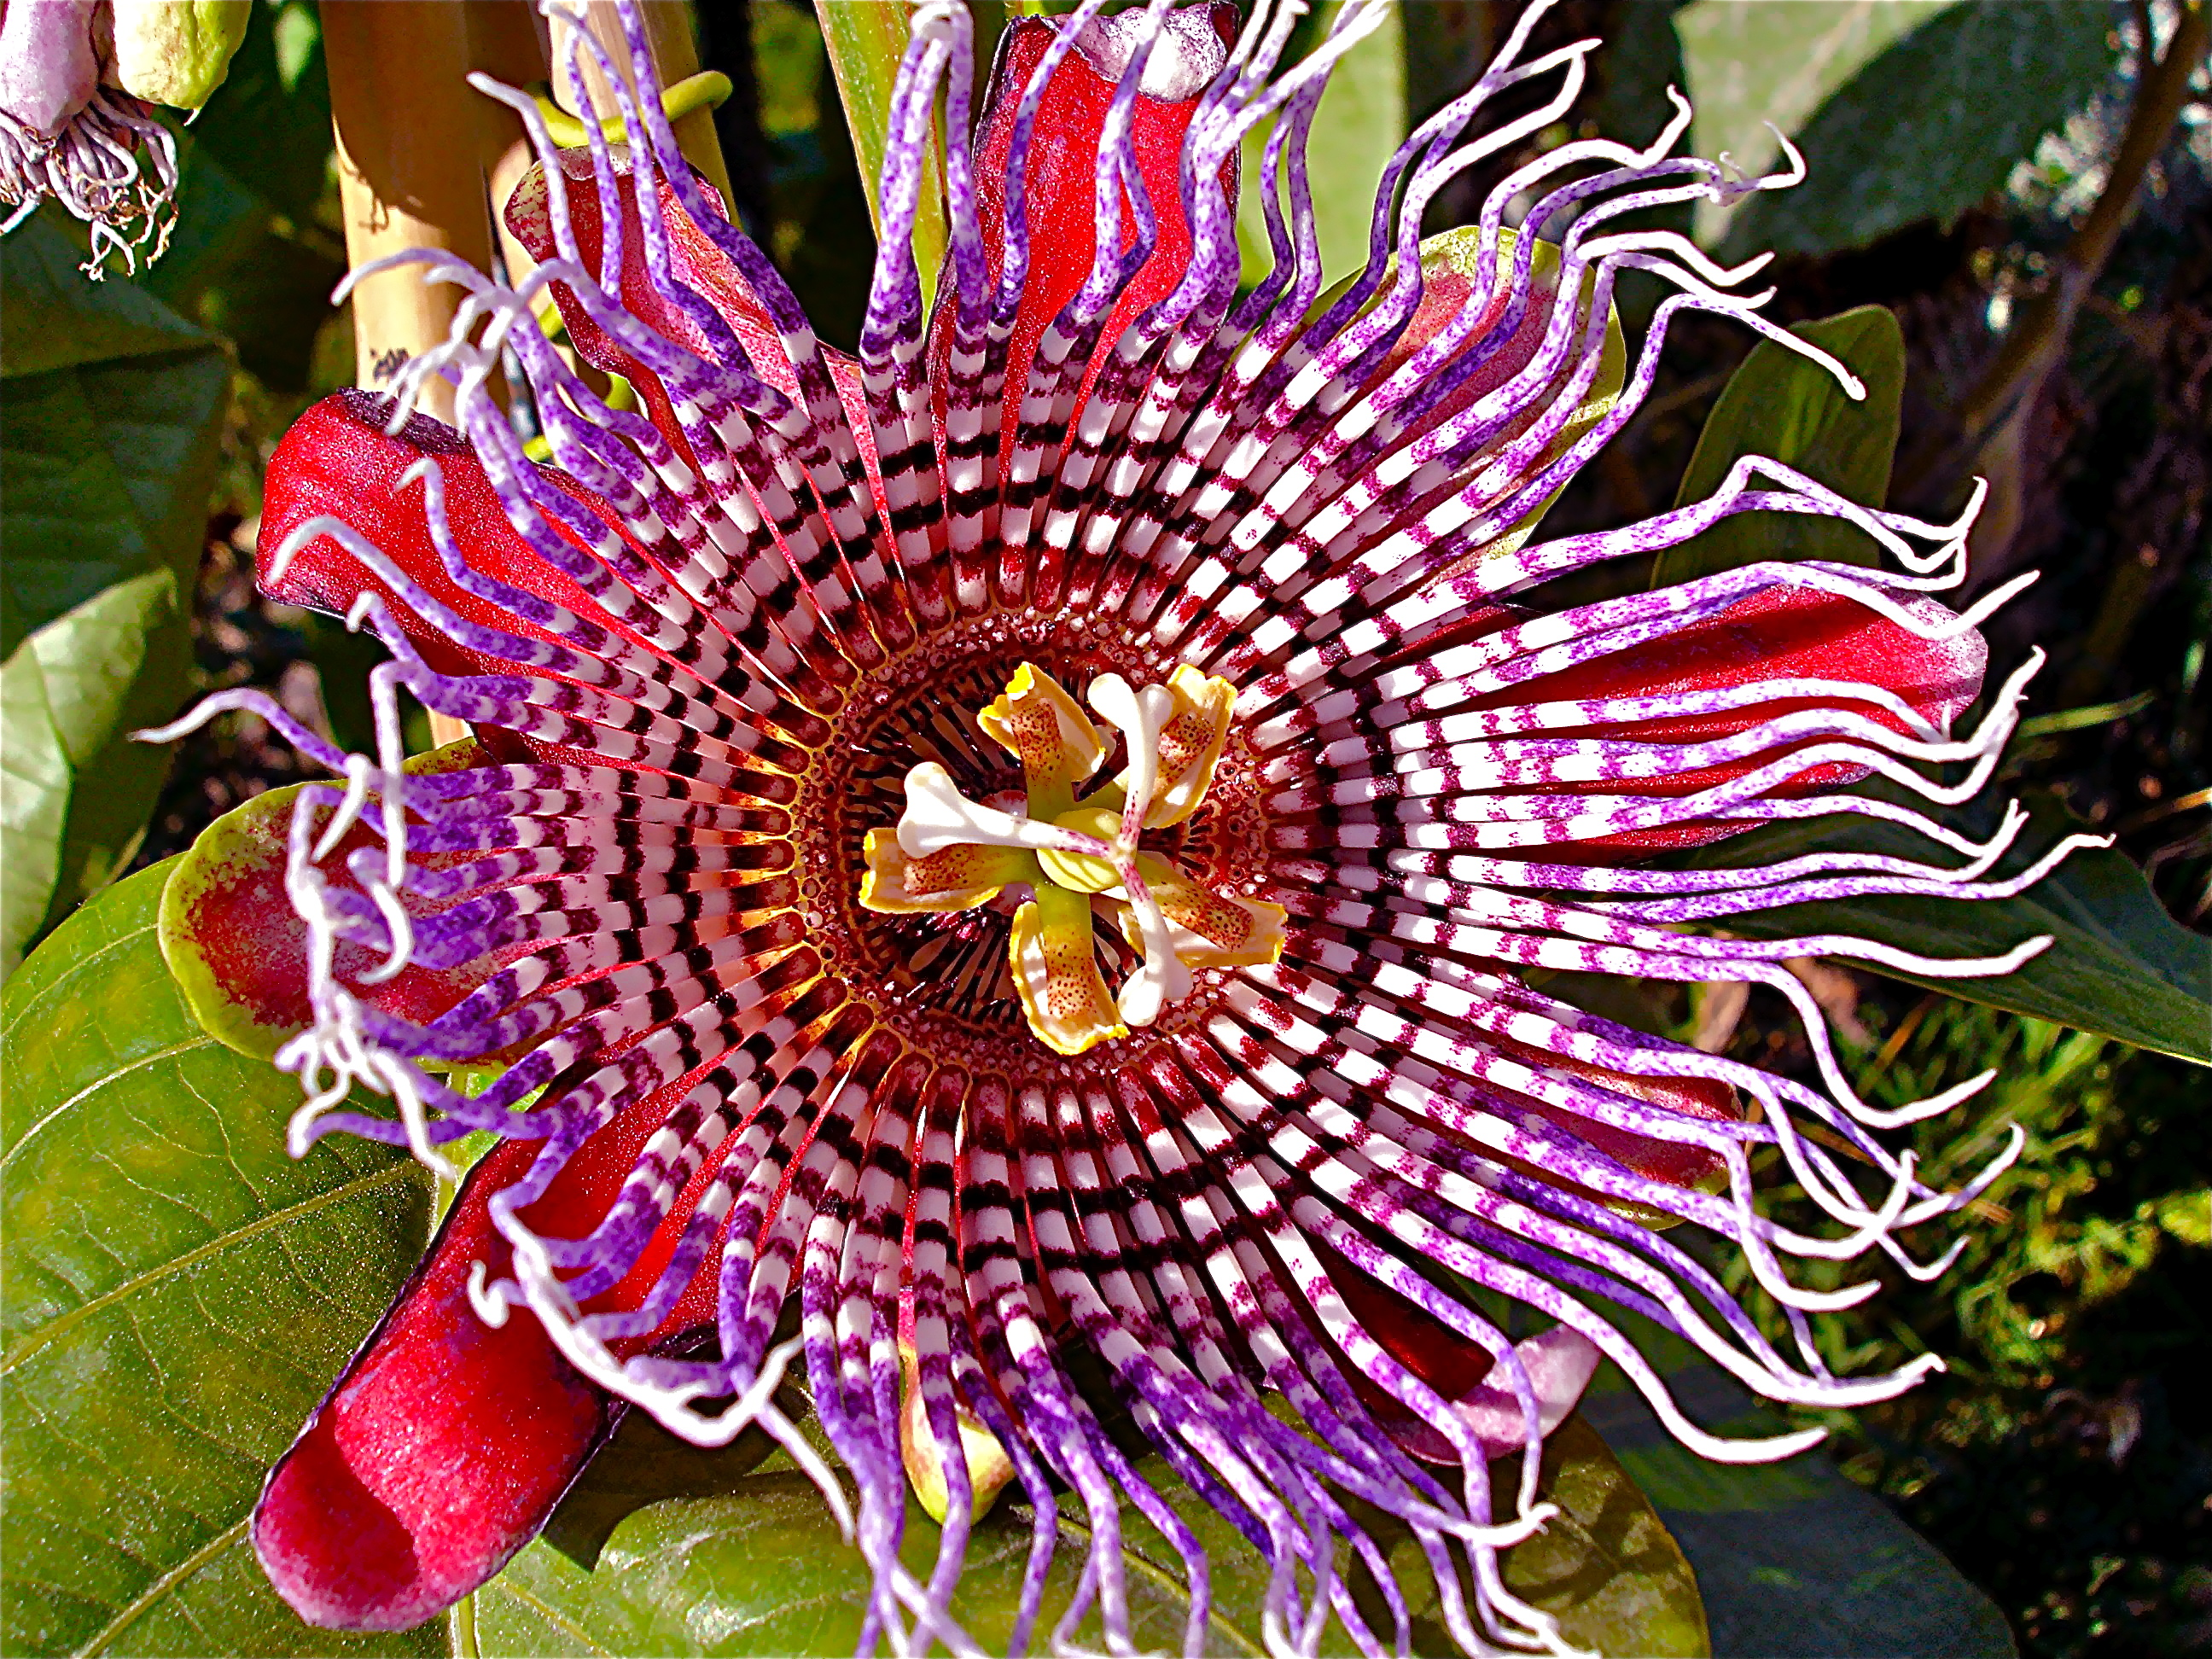 File:Passiflora × decaisneana 2.JPG - Wikimedia Commons